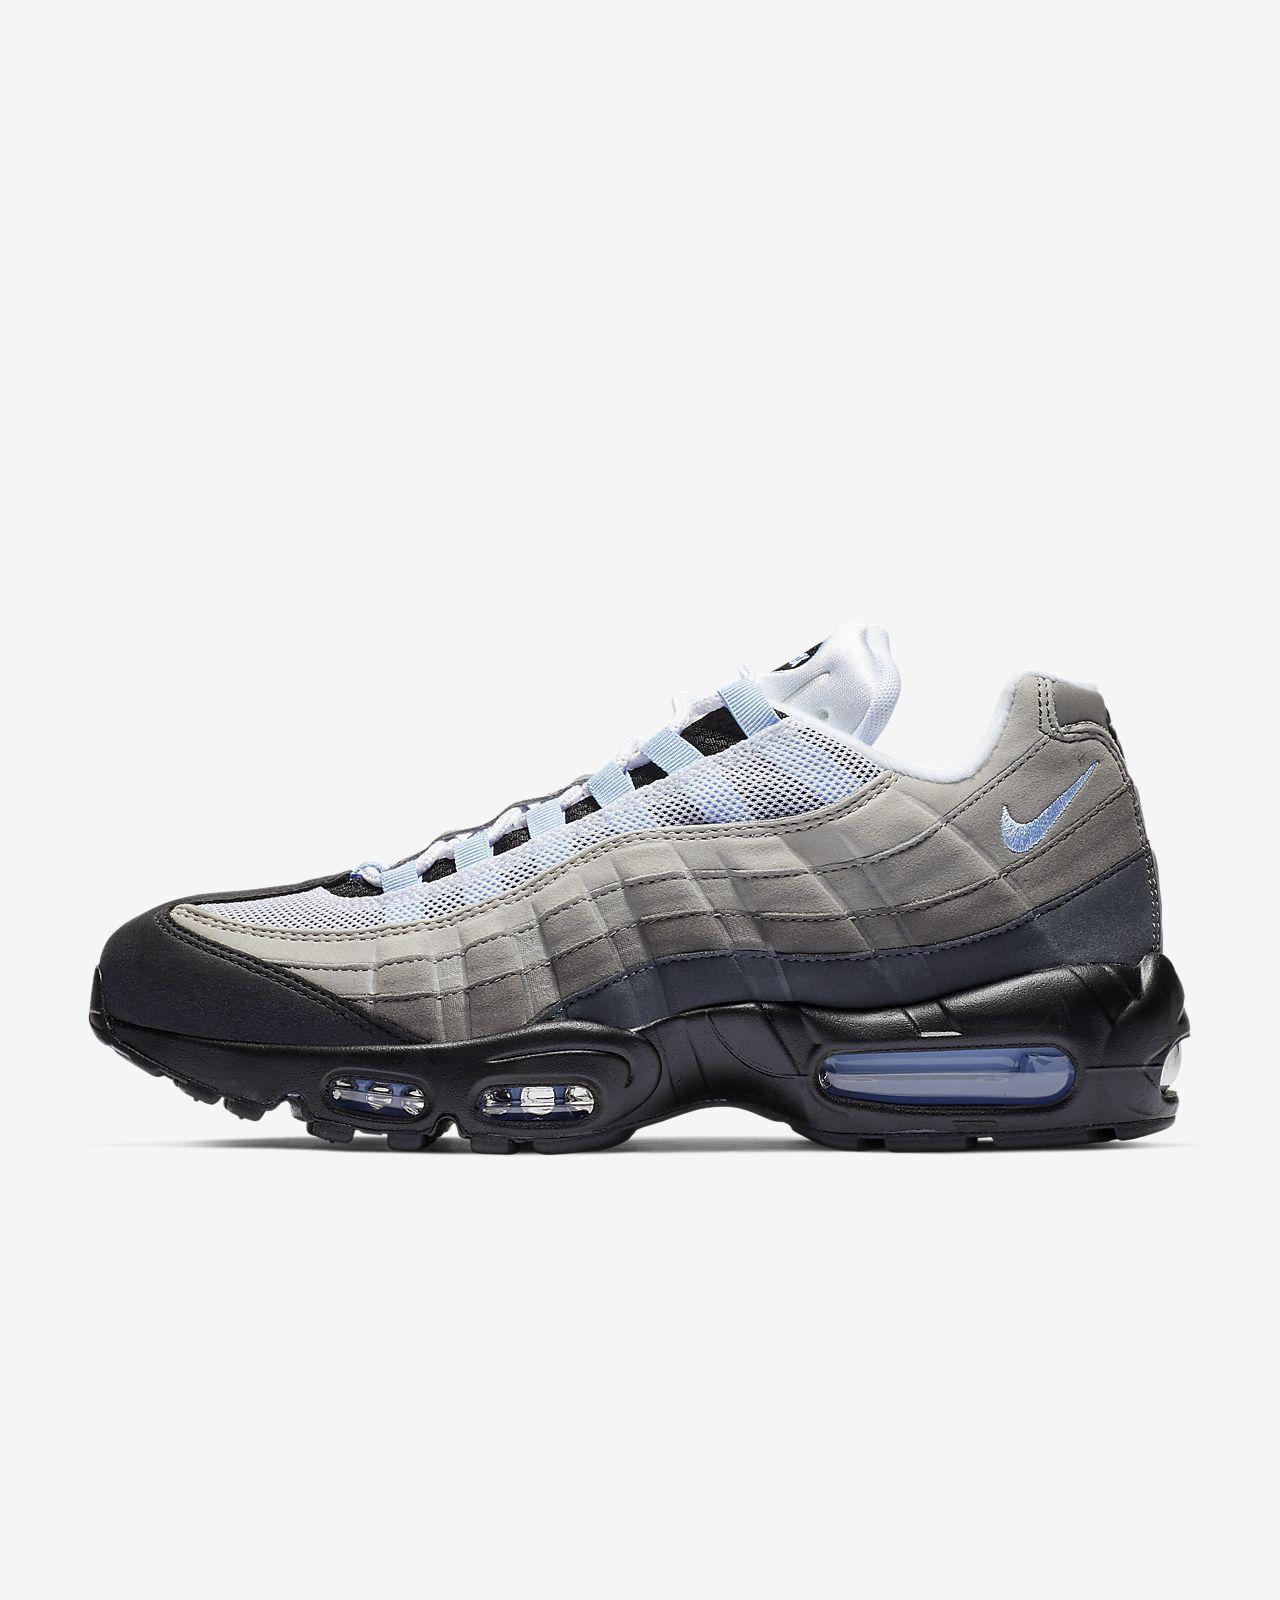 timeless design 6fee7 a12d3 ... Chaussure Nike Air Max 95 pour Homme